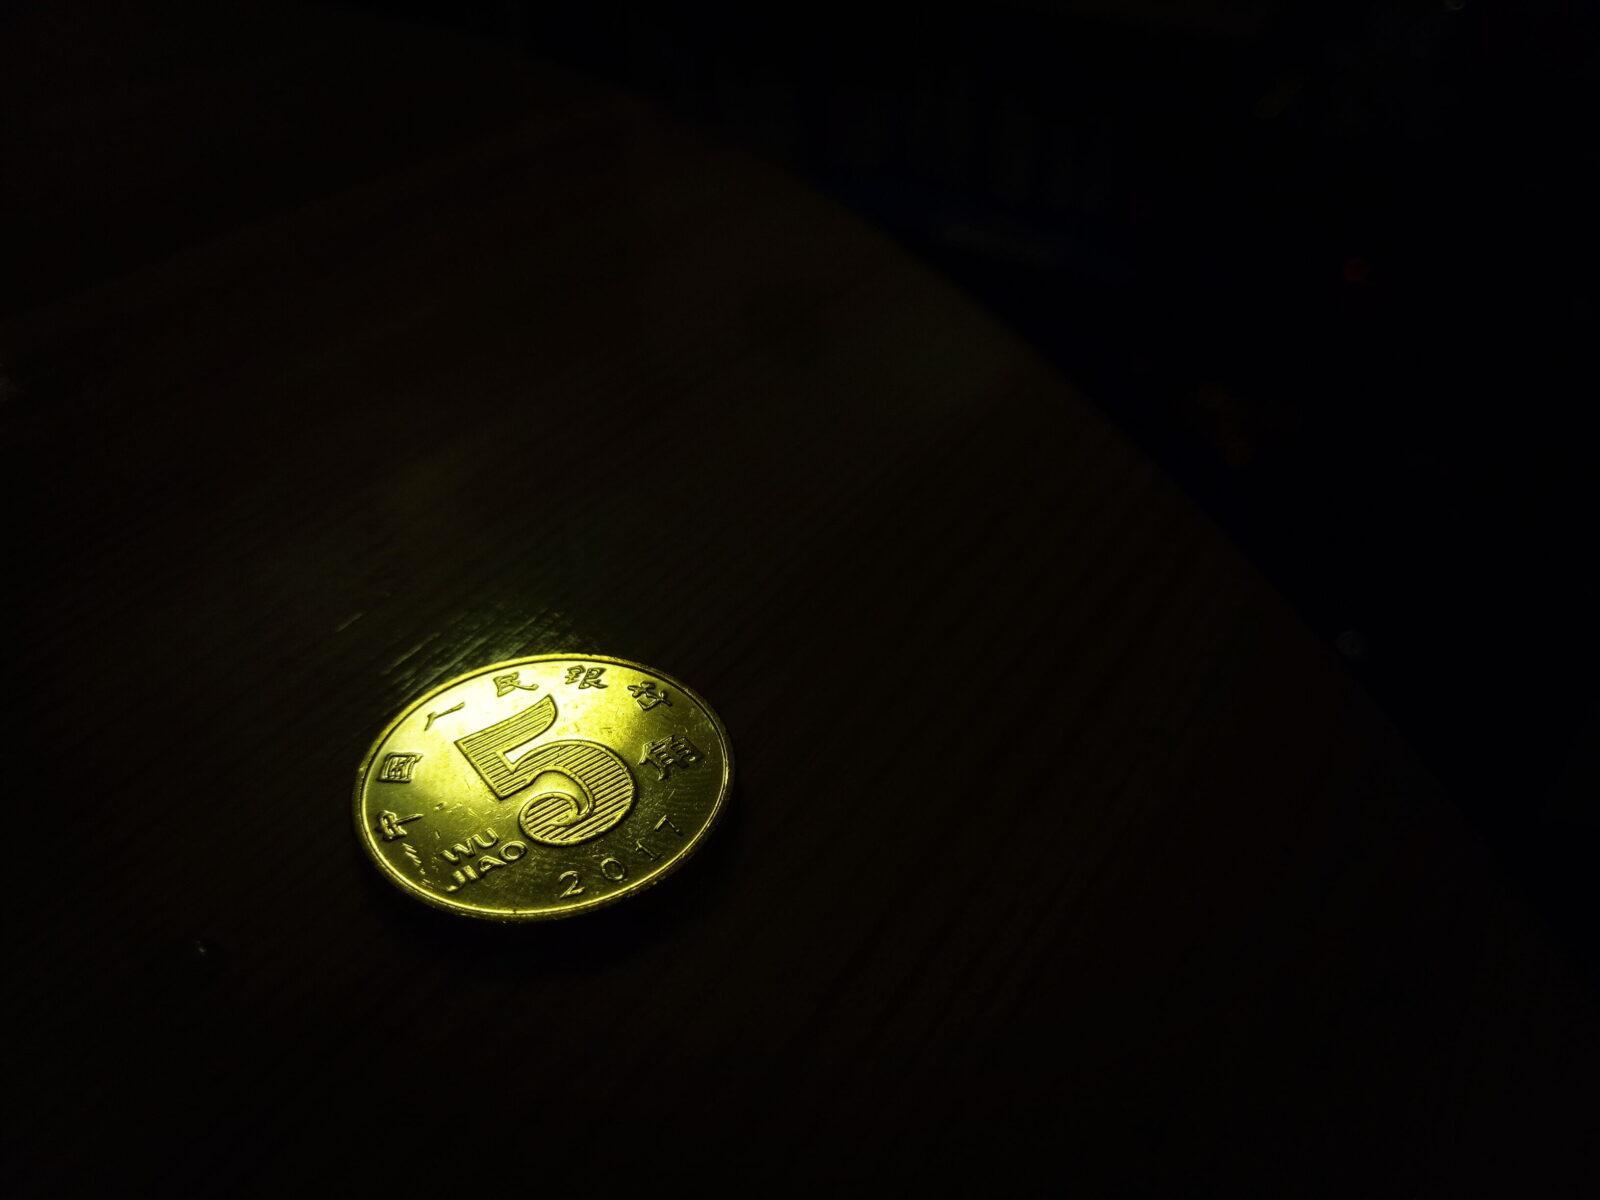 Wu Mao 50 Cents